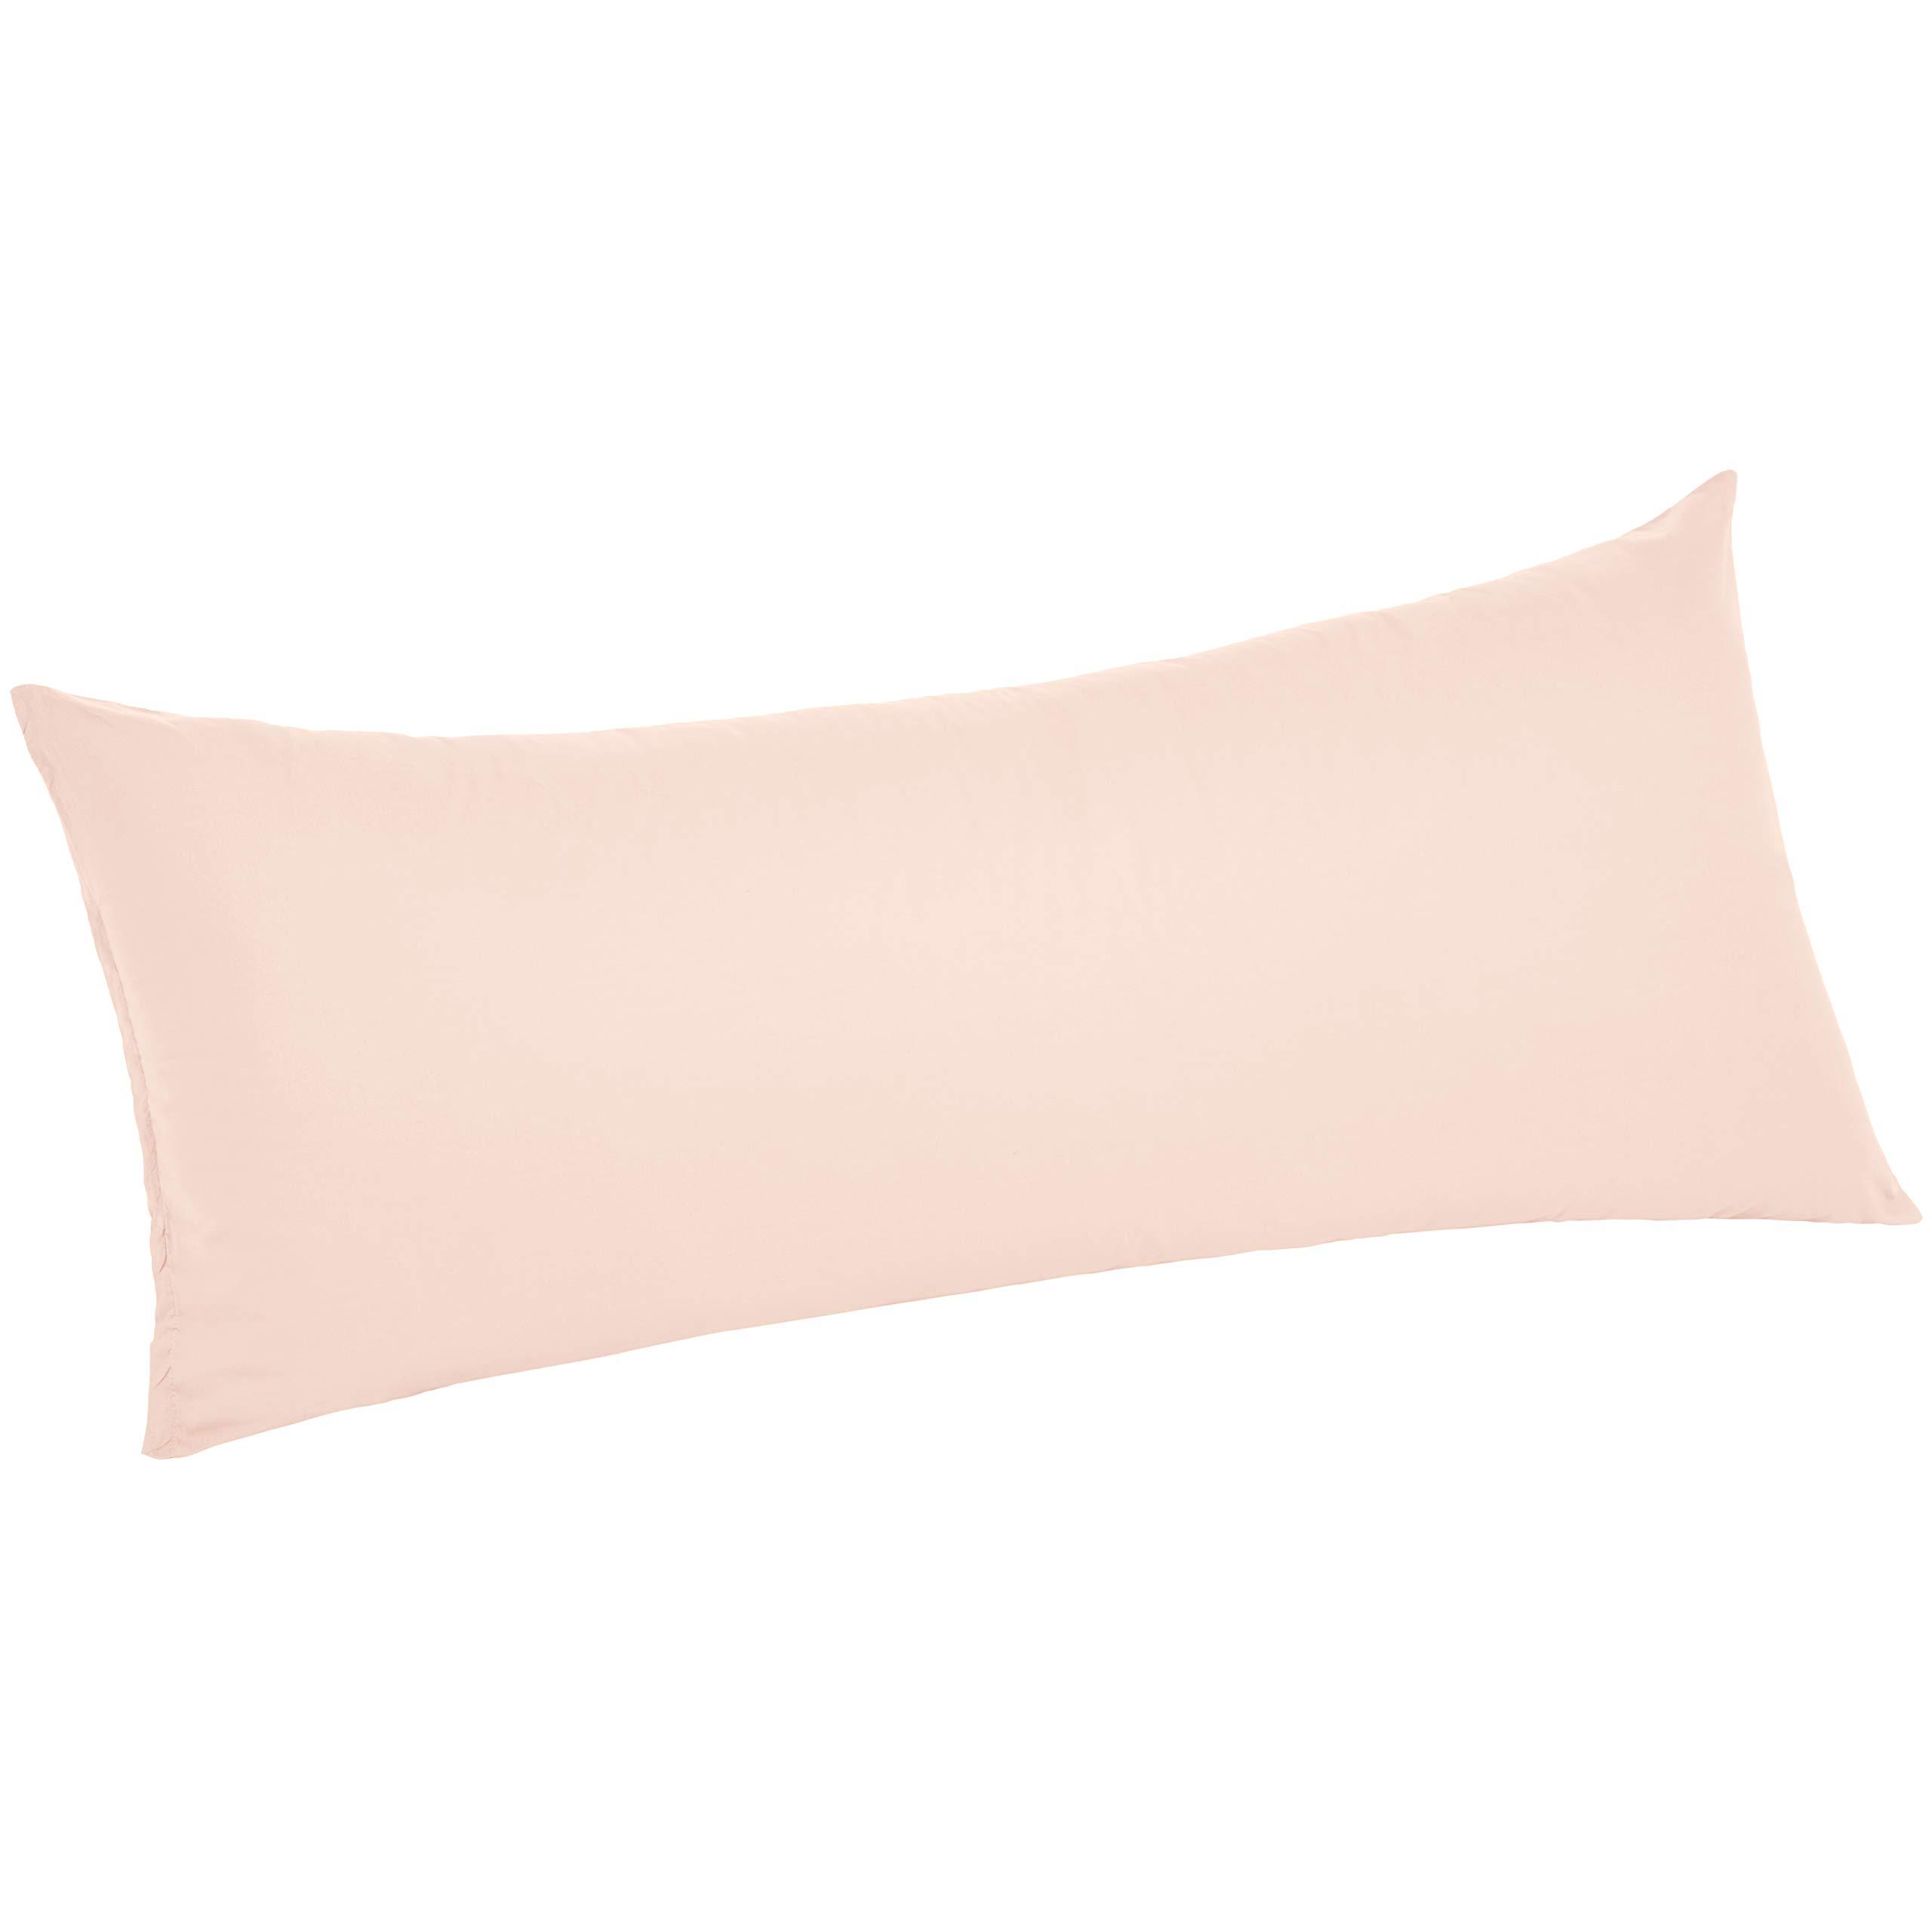 "AmazonBasics Ultra-Soft Body Pillow Cover Pillowcase, Breathable, Easy to Wash, 55"" x 21"", Blush"